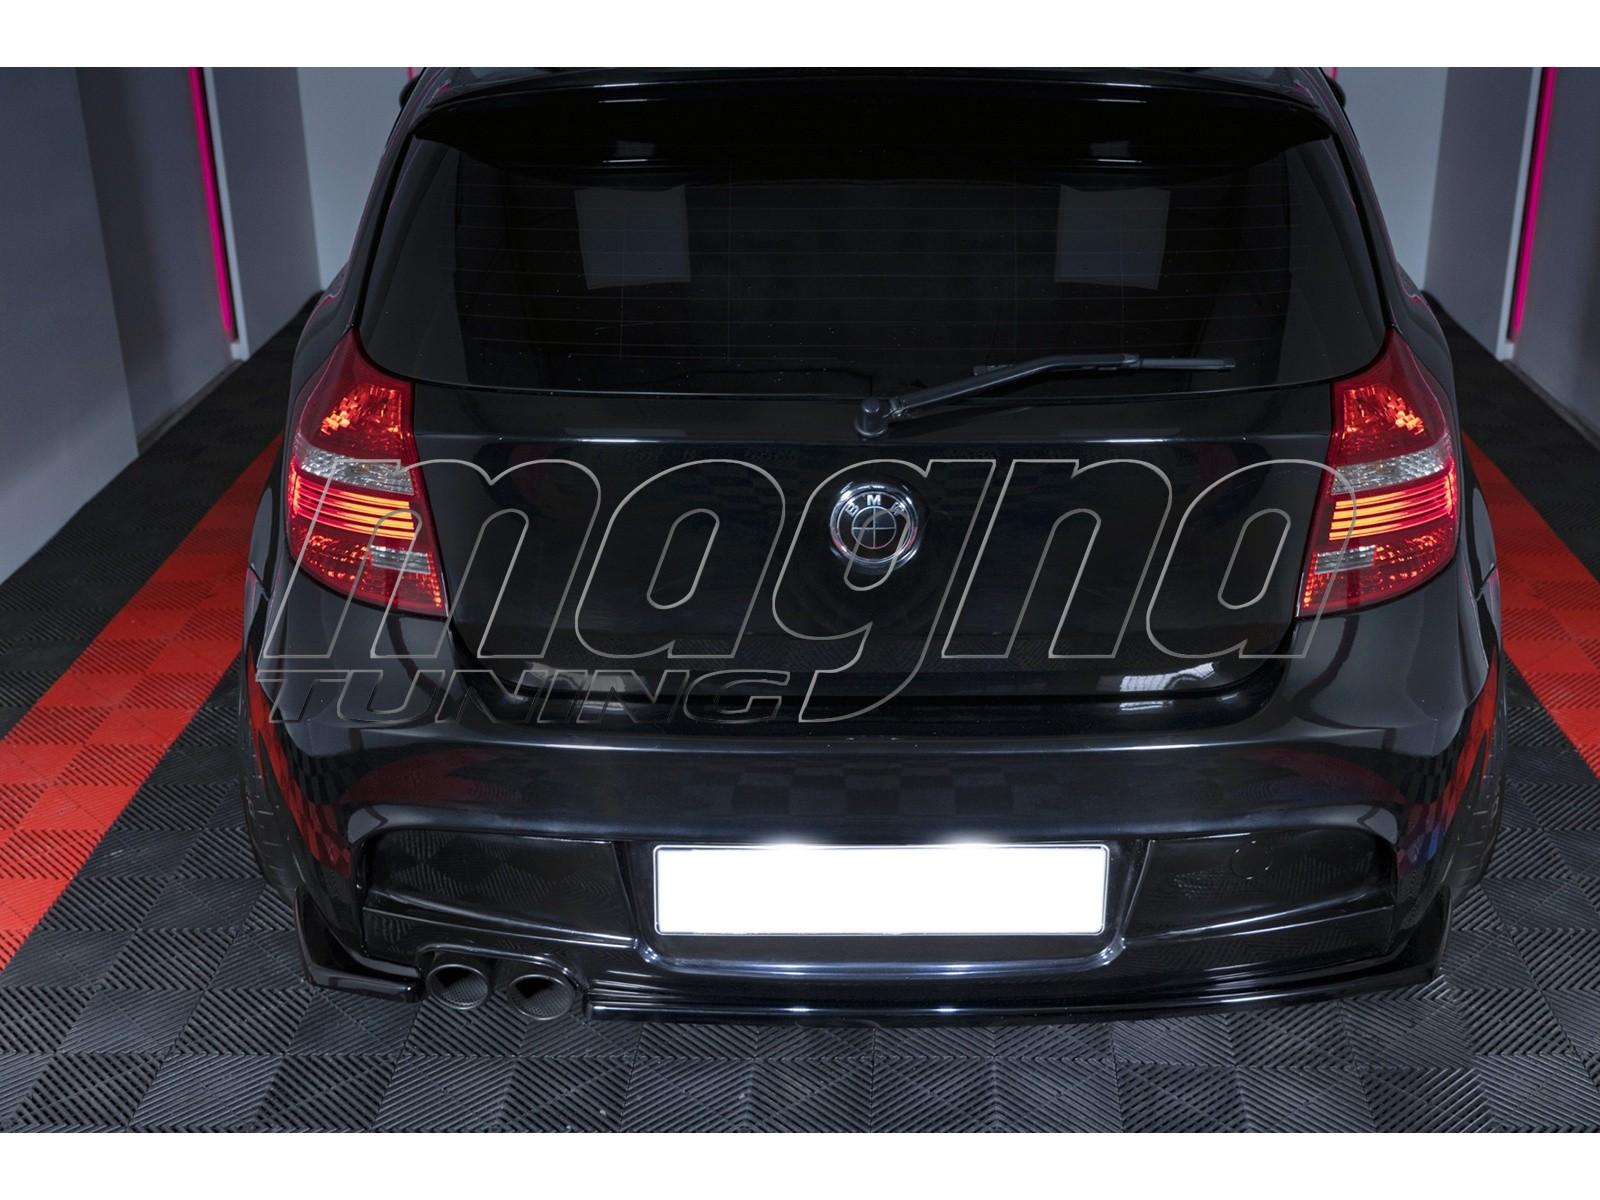 BMW E81 / E87 Matrix Heckansatz